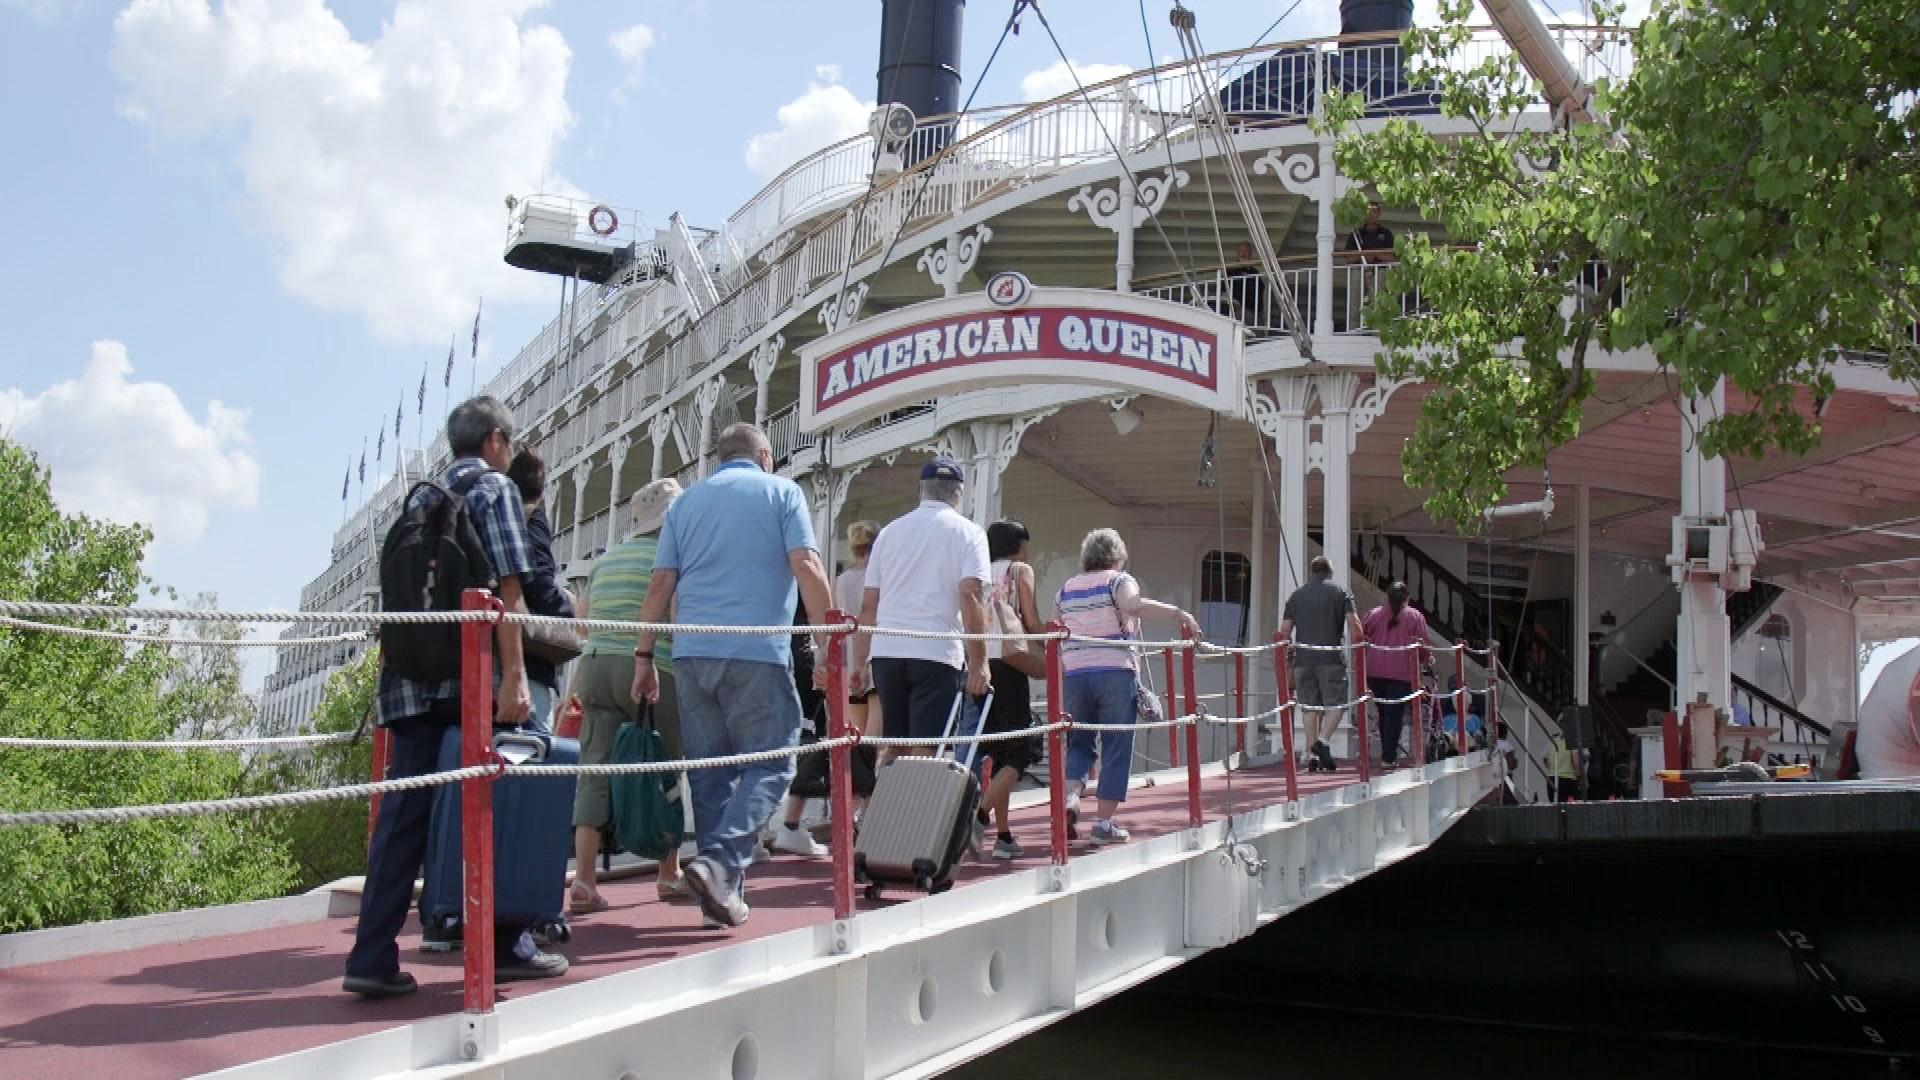 guests walking aboard the American Queen